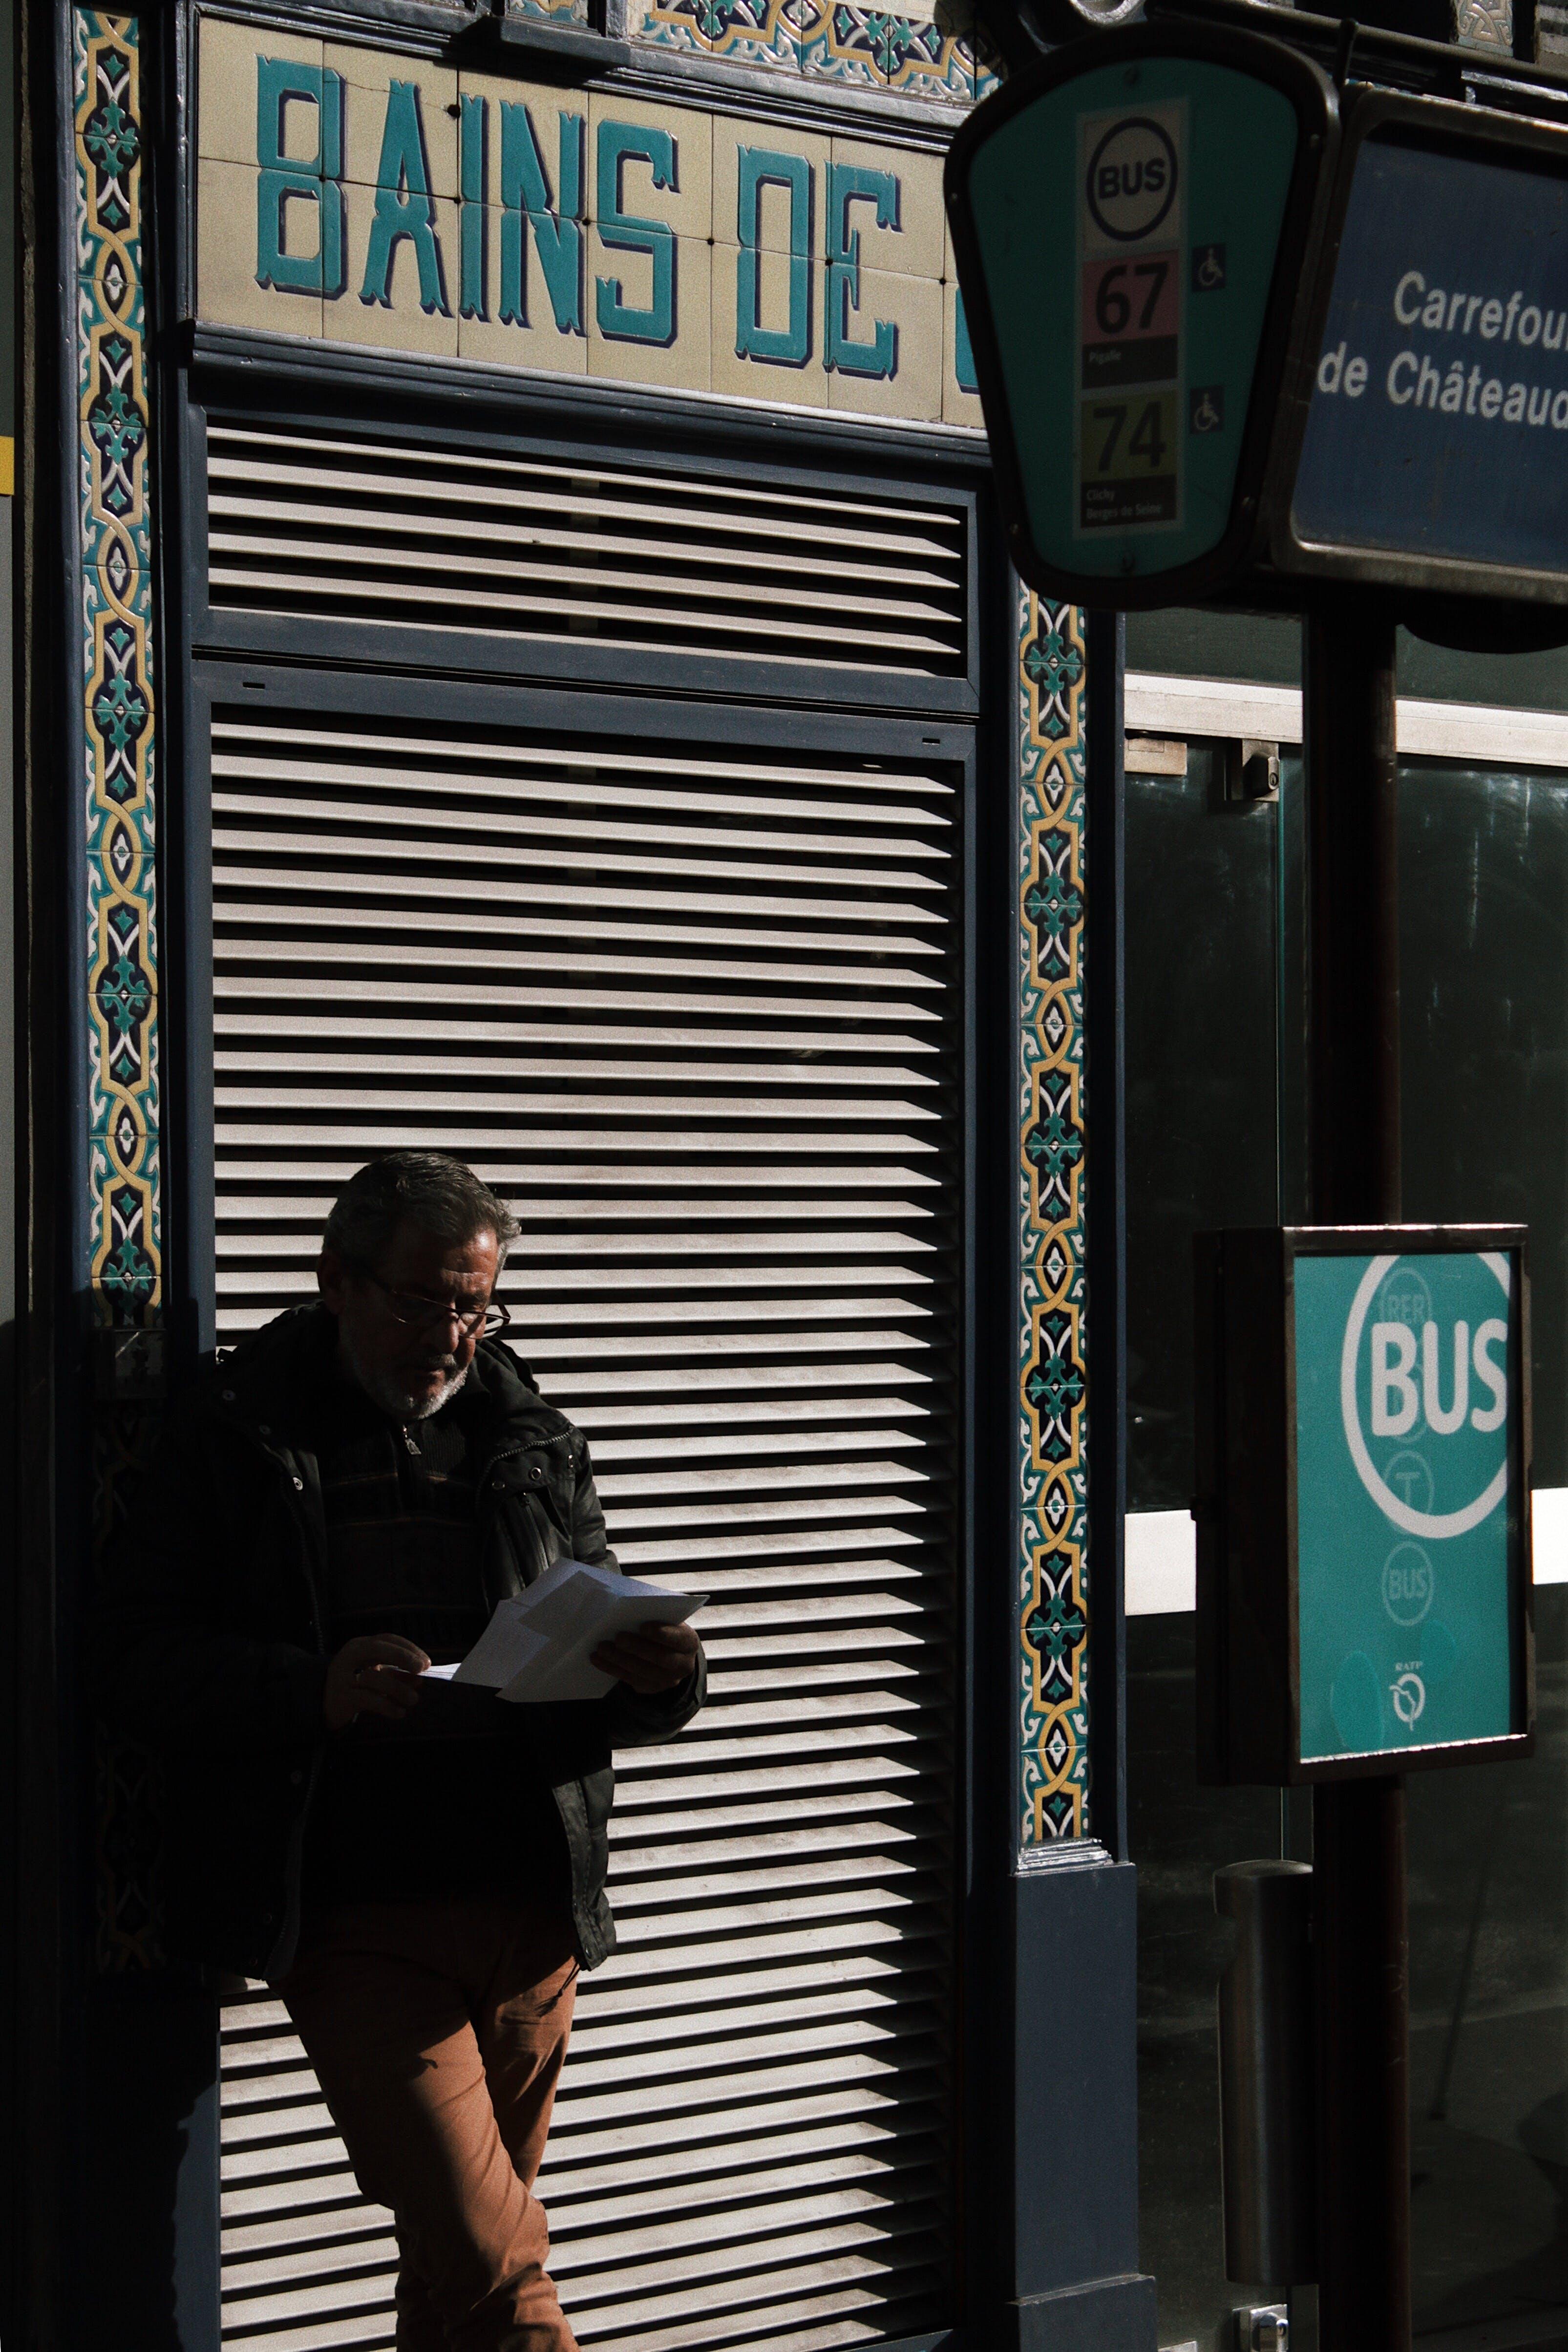 Man Reading Newspaper in Street